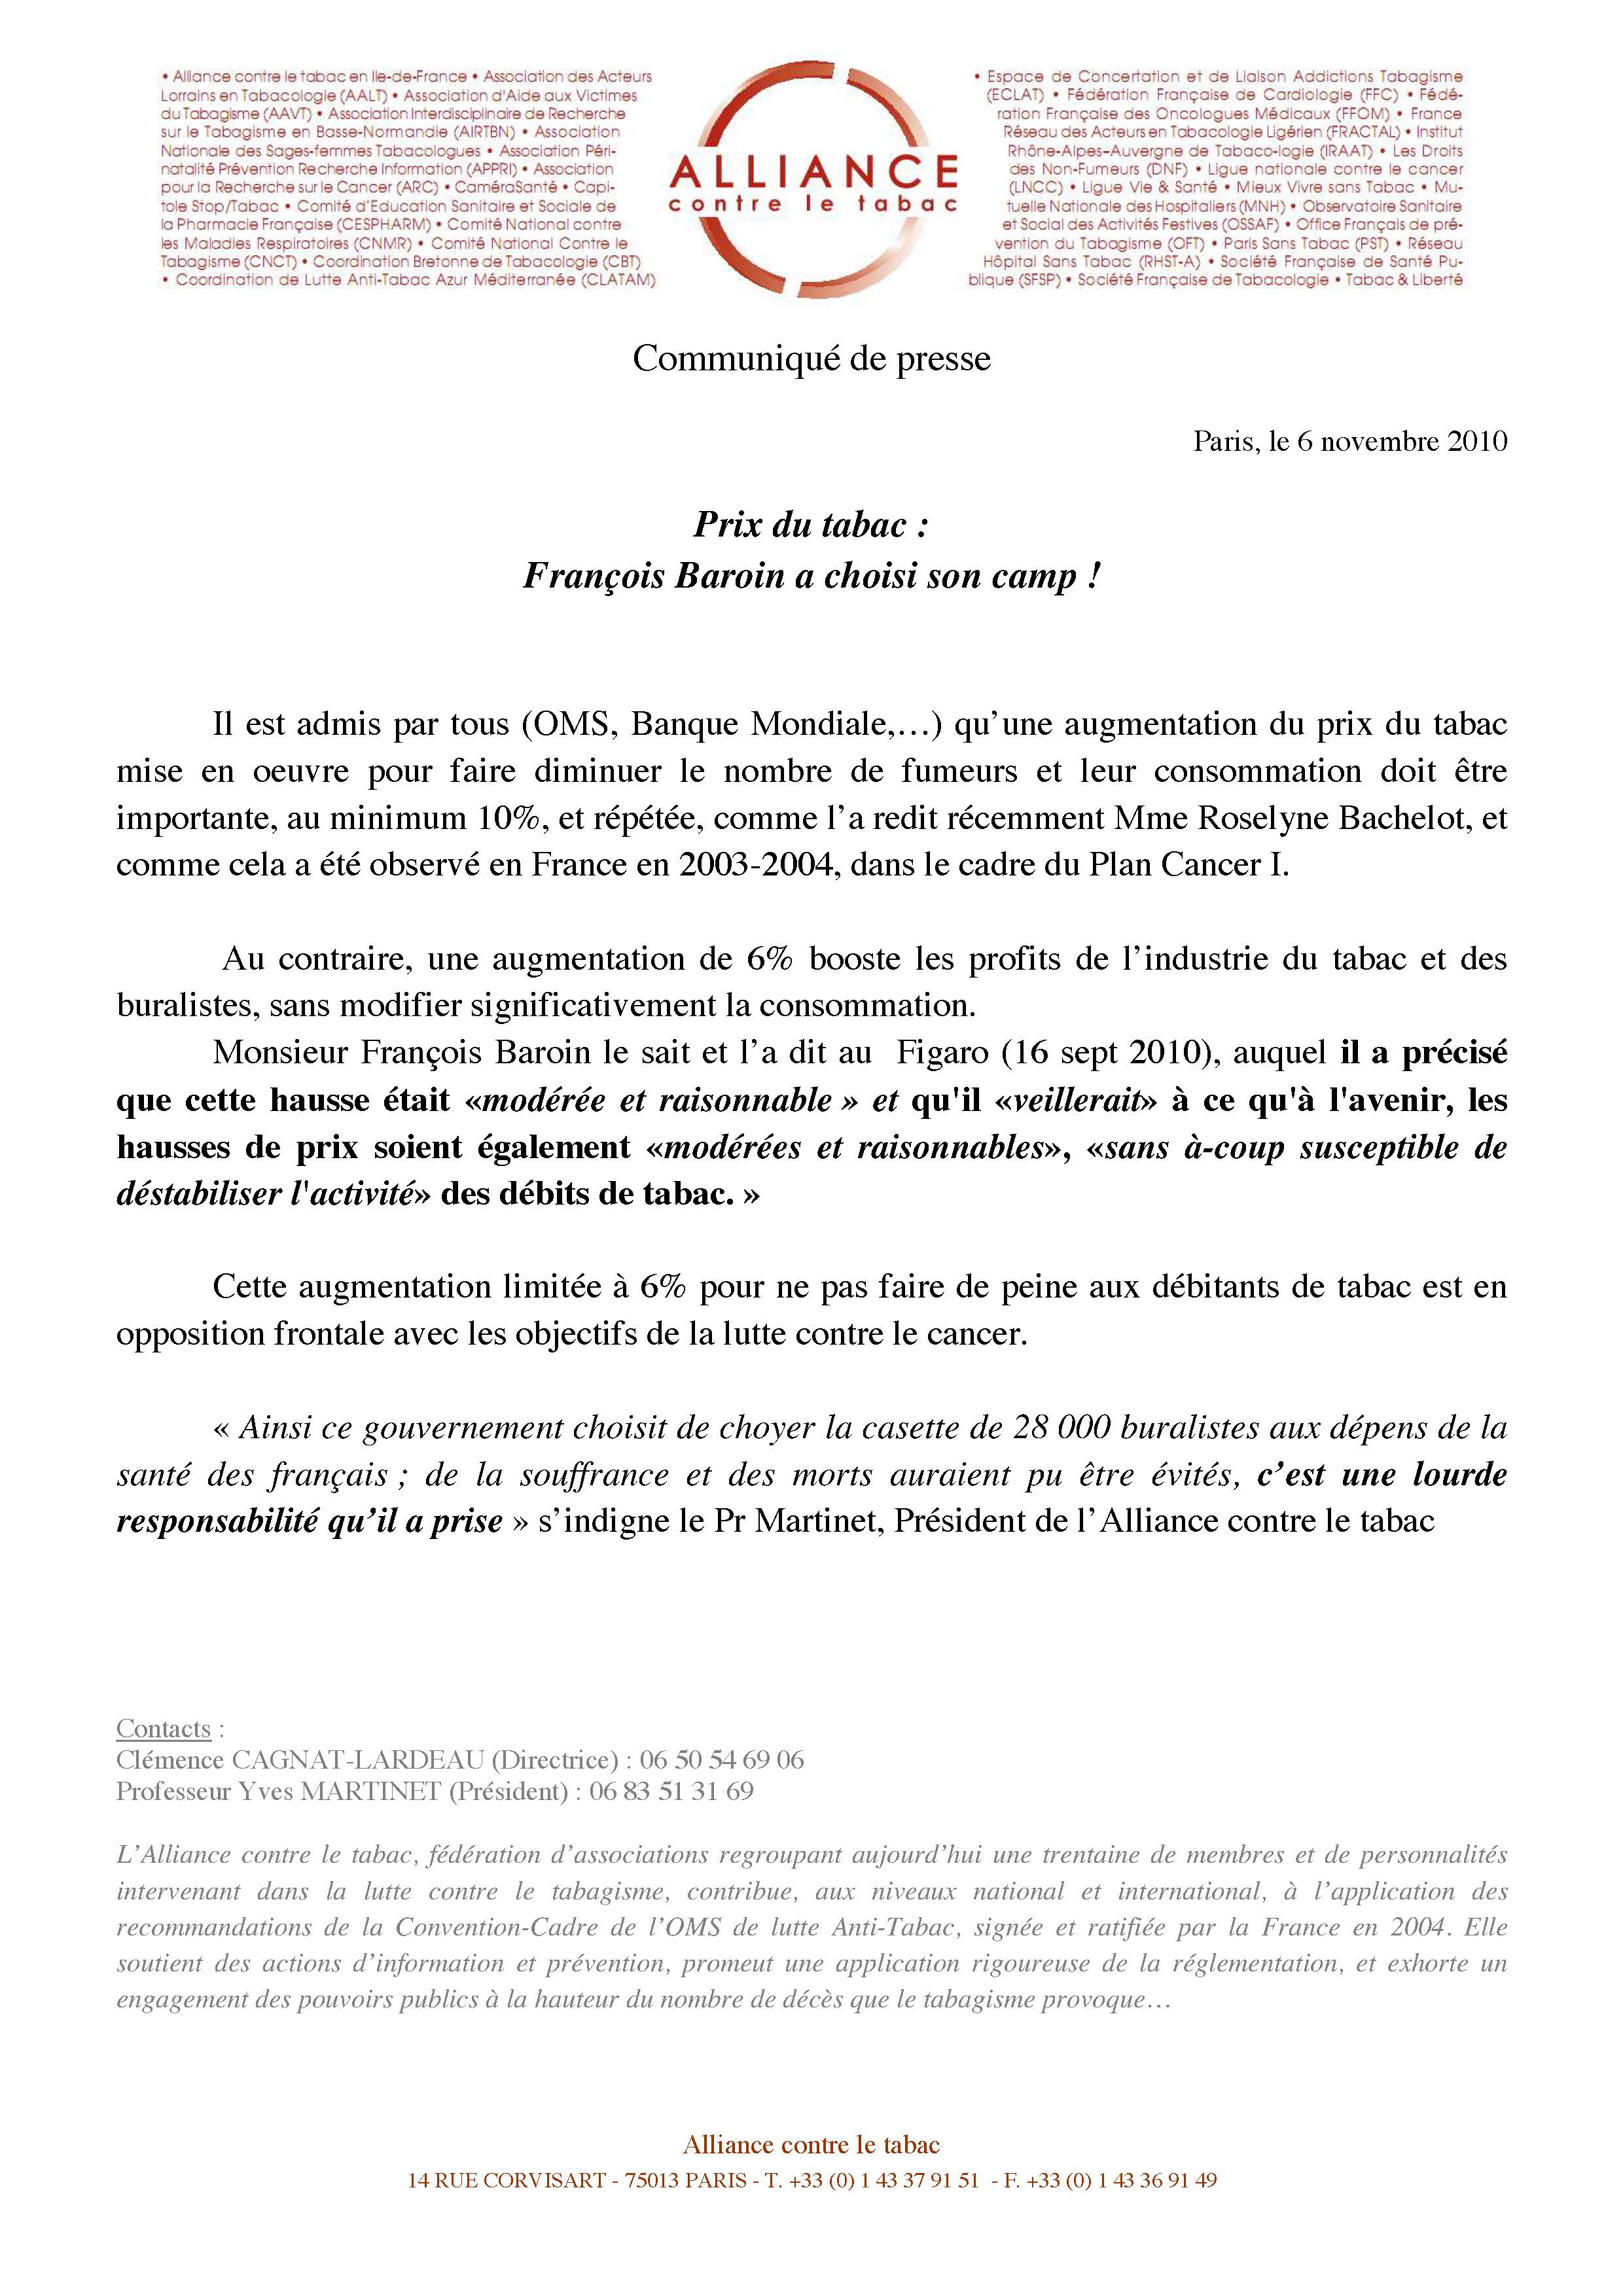 Alliance-CP_francois-baroin-a-choisi-son-camp-06nov2010.jpg